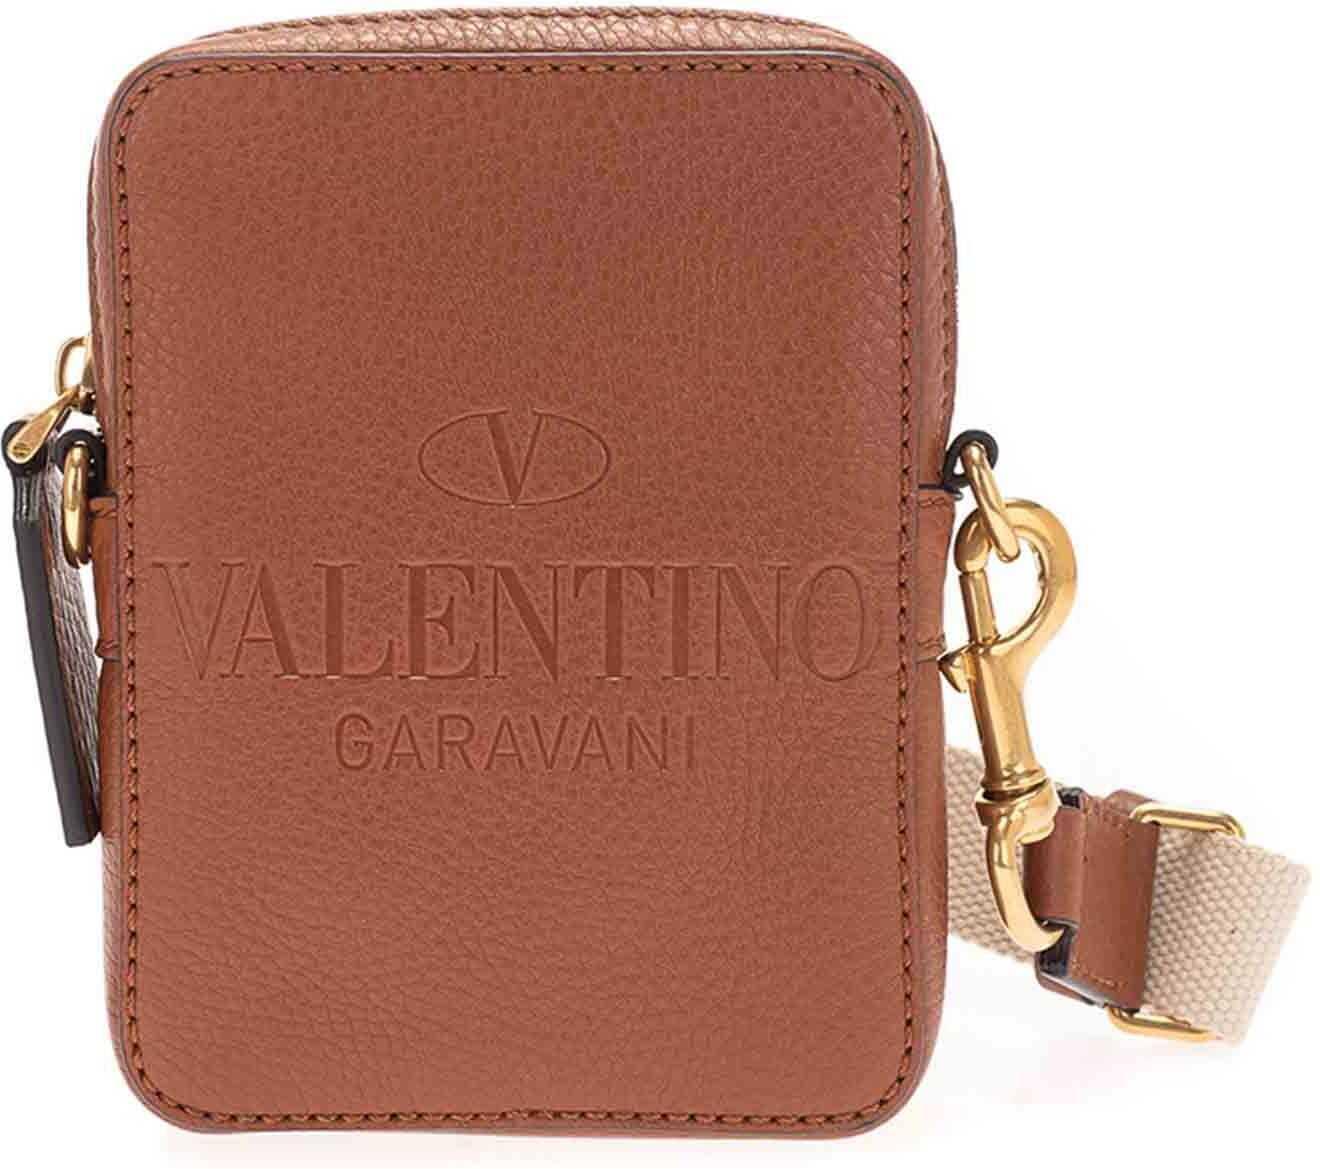 Valentino Garavani Logo Cross Body Bag In Brown VY0B0943QPTHG5 Brown imagine b-mall.ro